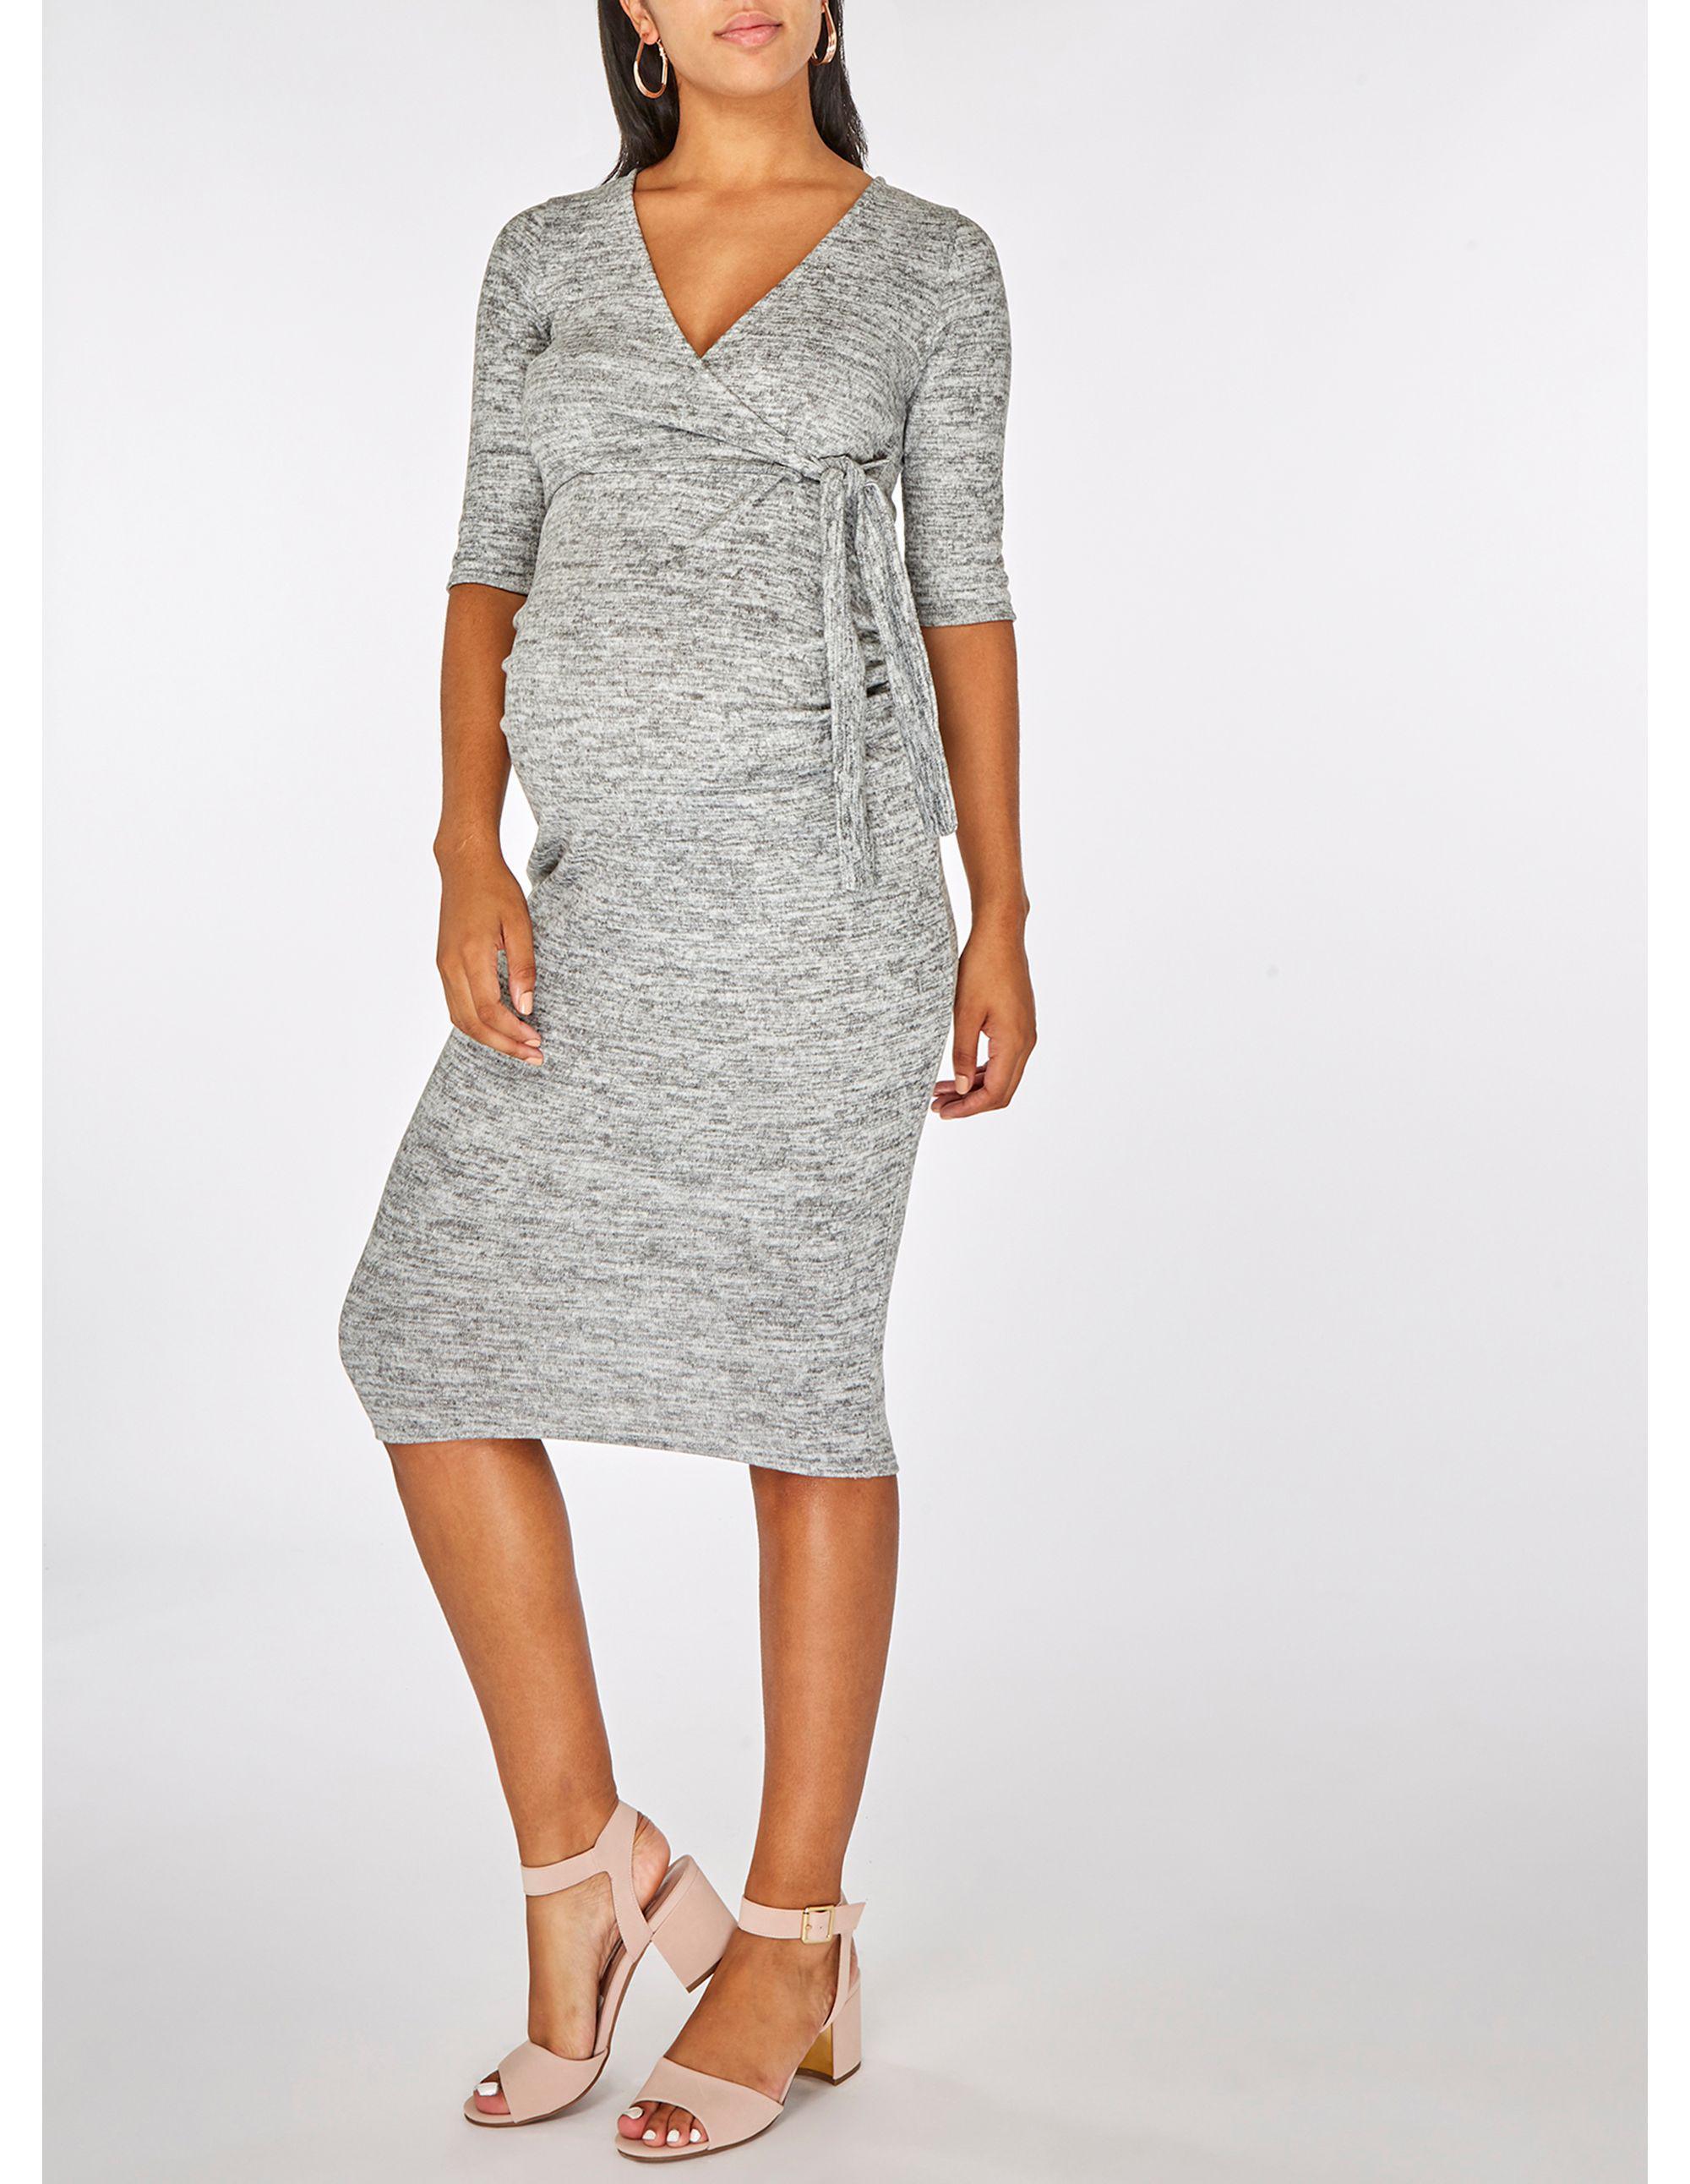 b87ce873a329d Debenhams Sale Maternity Dresses – DACC